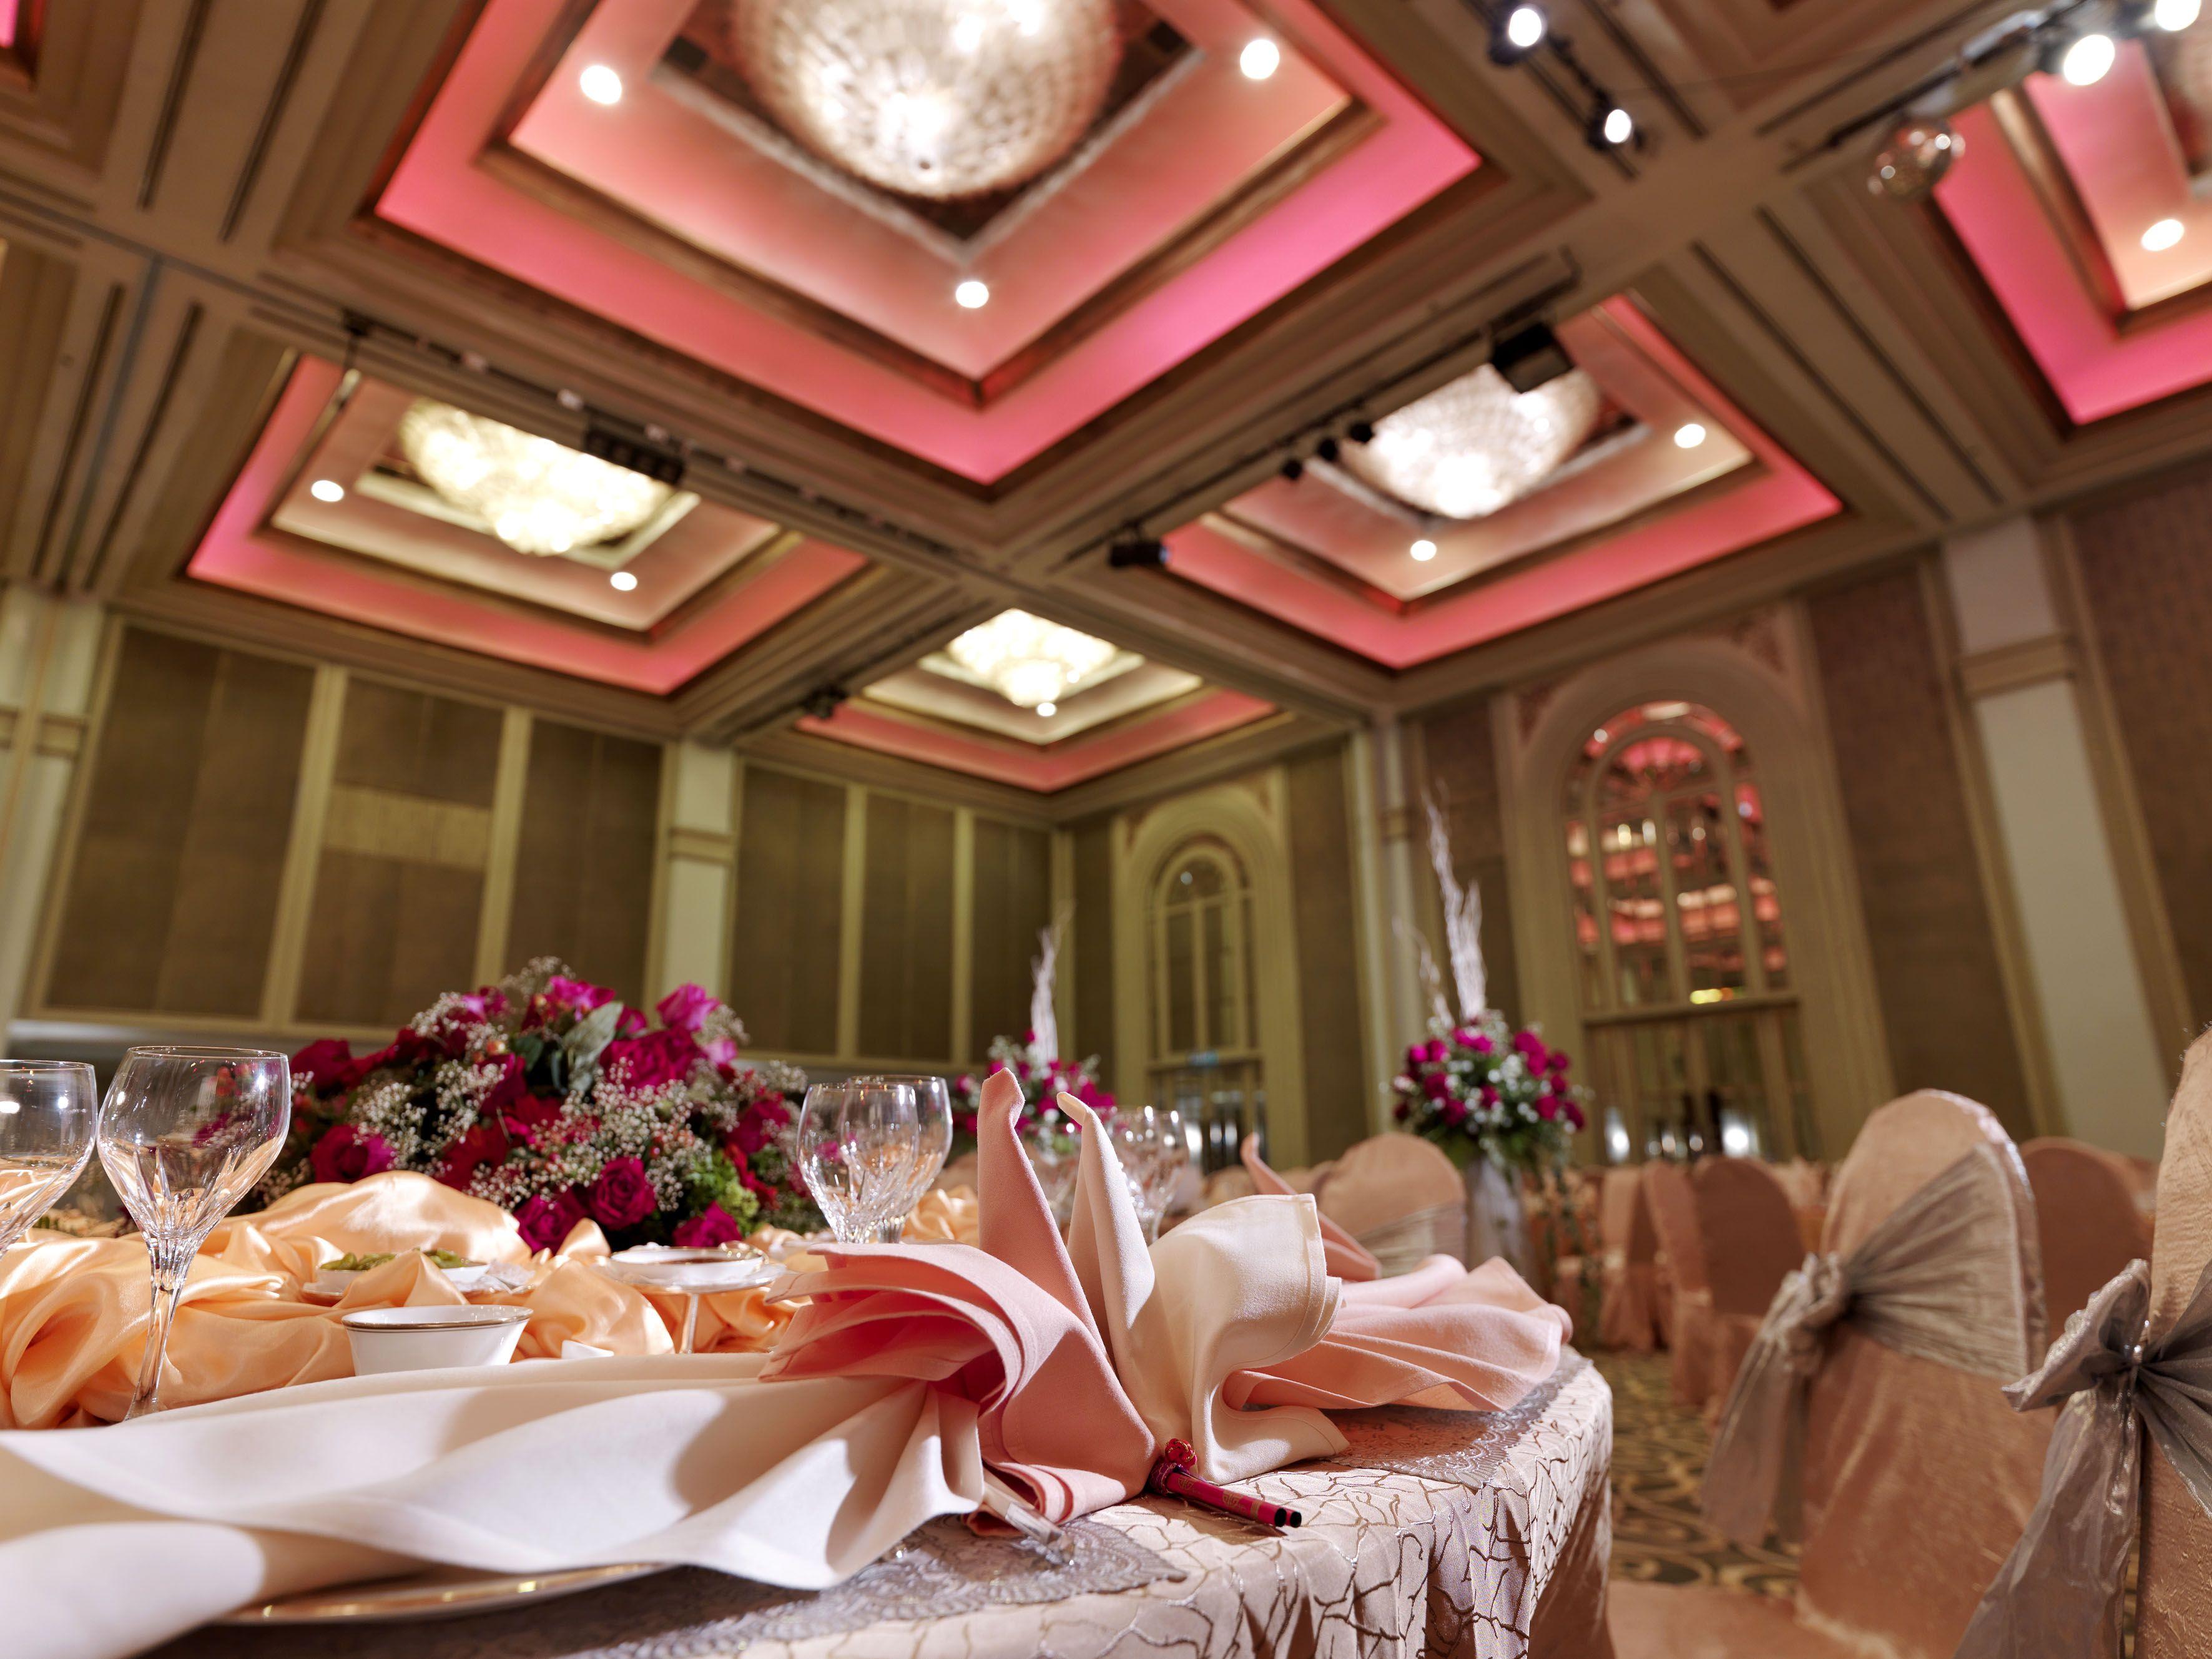 Make the wedding of your dreams come true talk to us and well make the wedding of your dreams come true talk to us and well junglespirit Choice Image